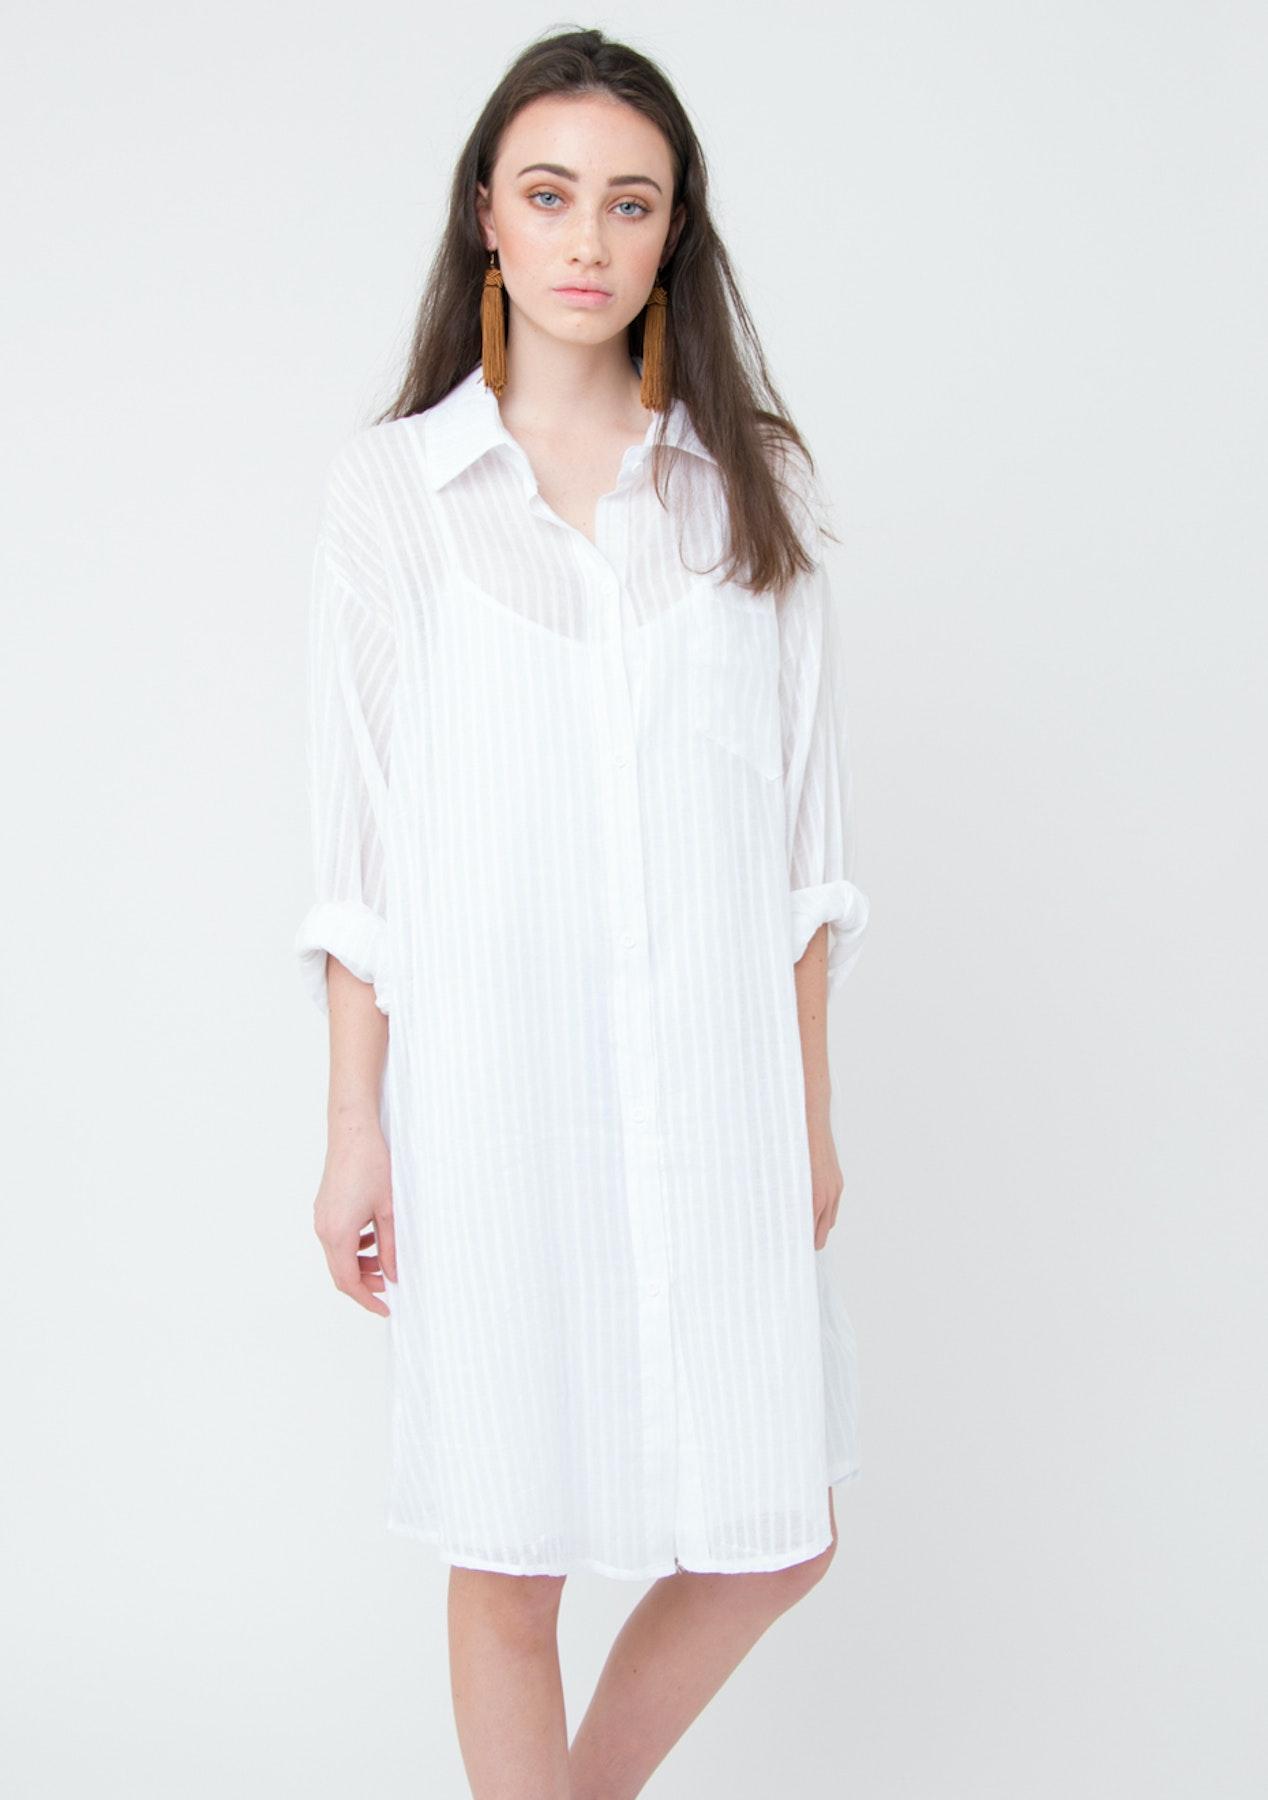 Fashion Edit Her Boyfriend Shirt Dress White Fashion